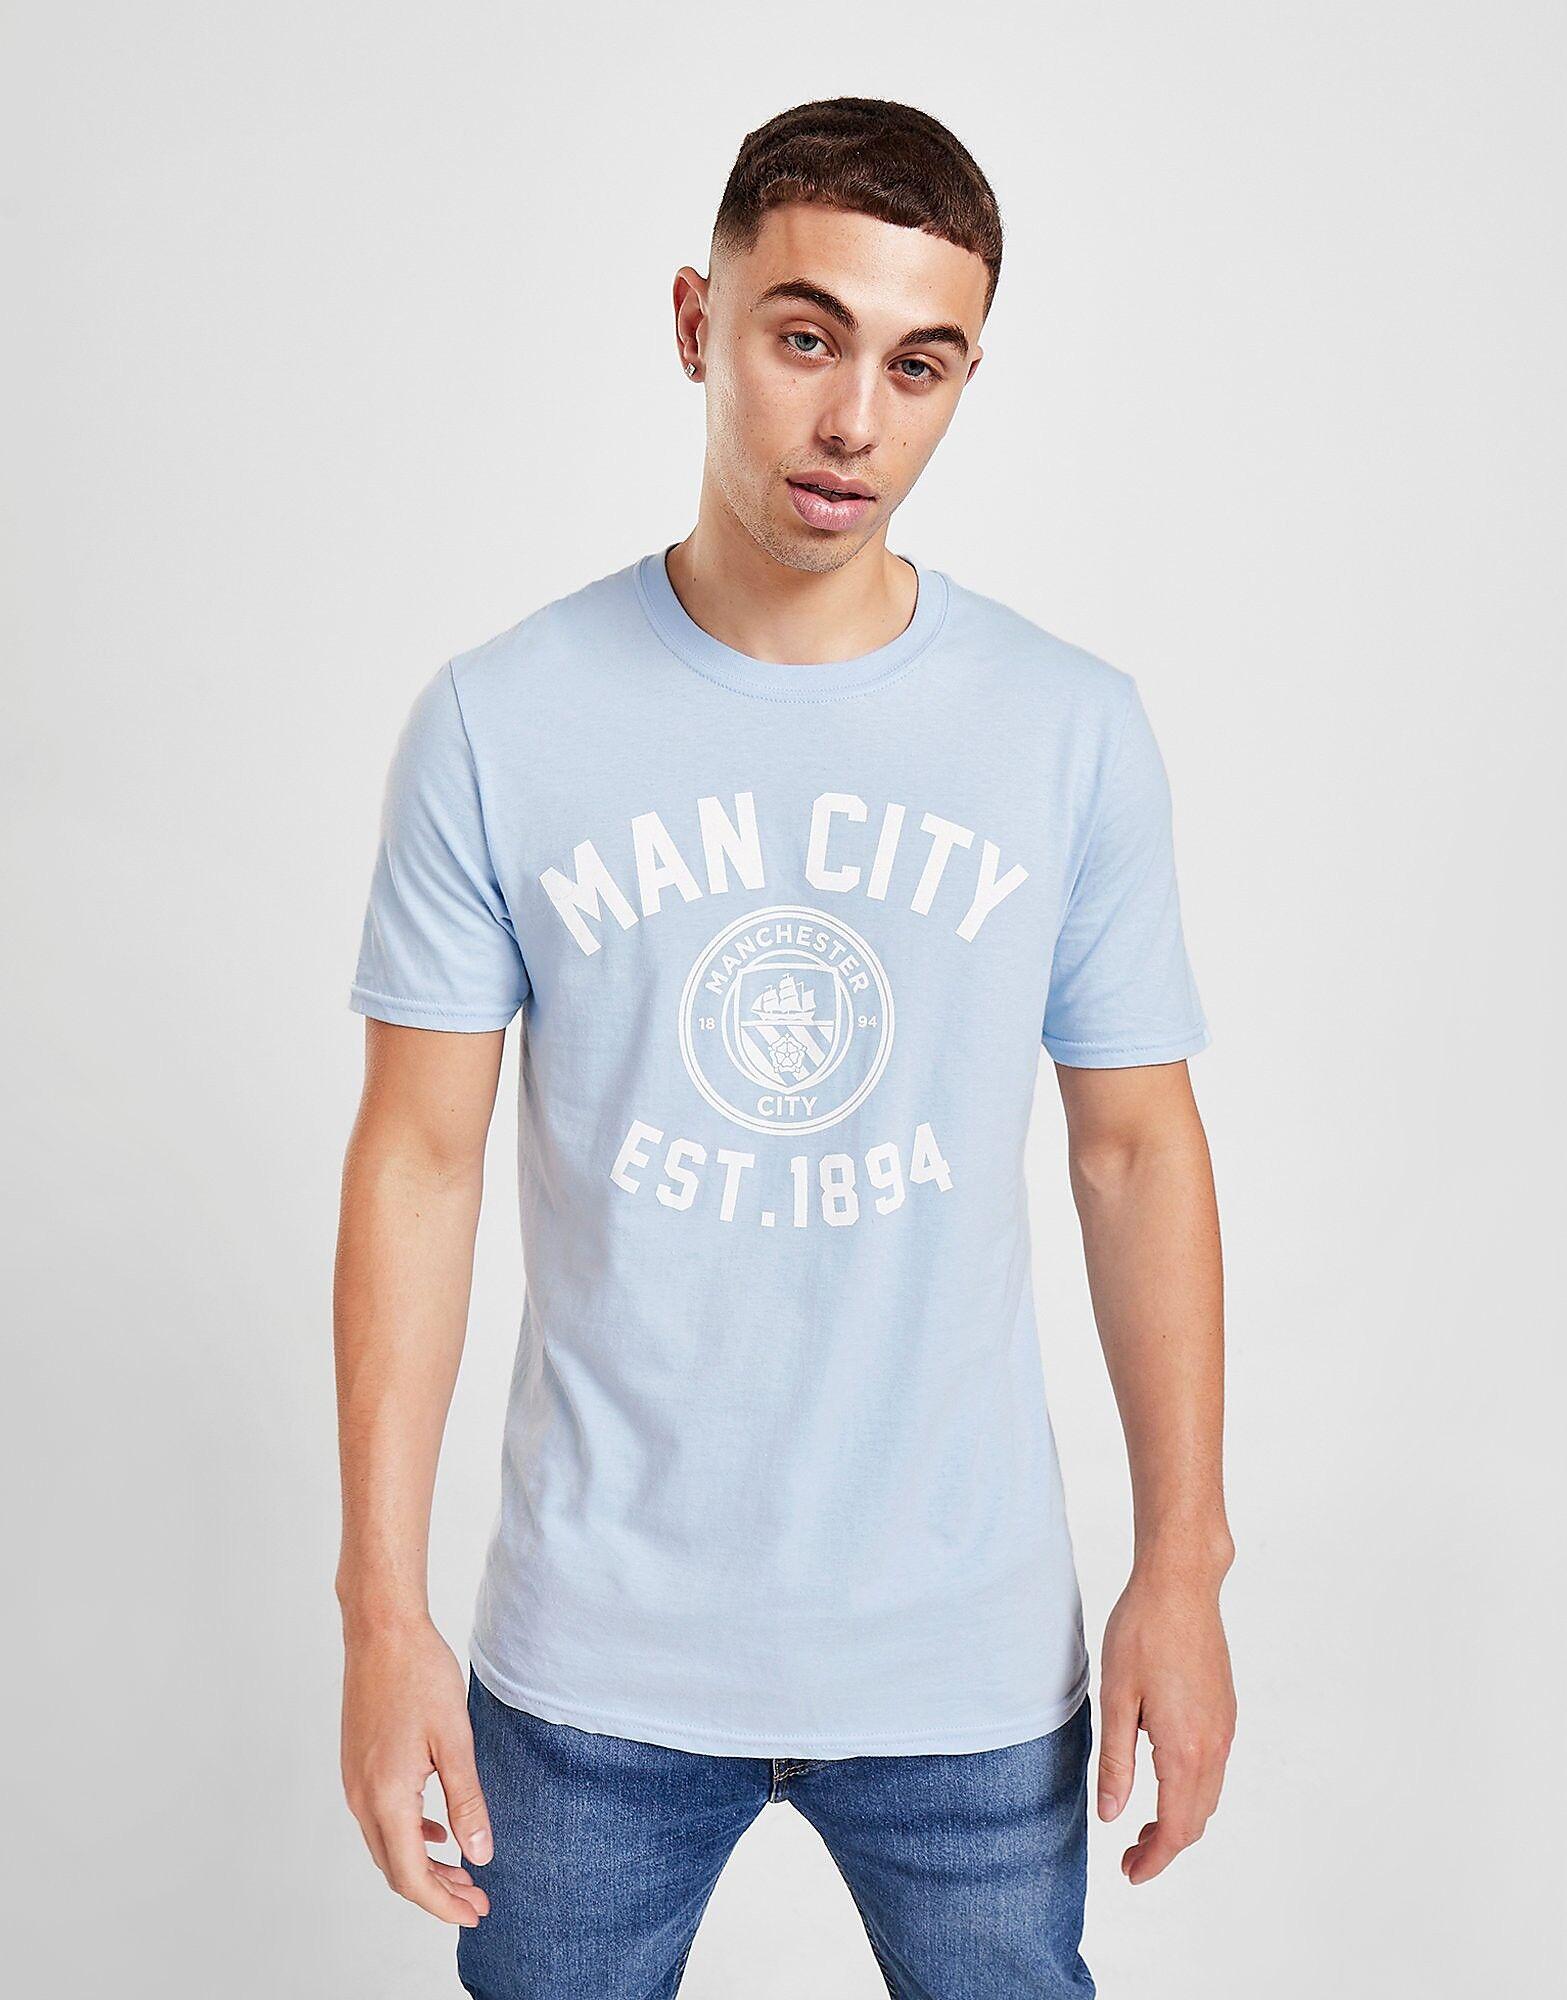 Official Team Manchester City F.C Stadium -t-paita Miehet - Mens, Sky Blue